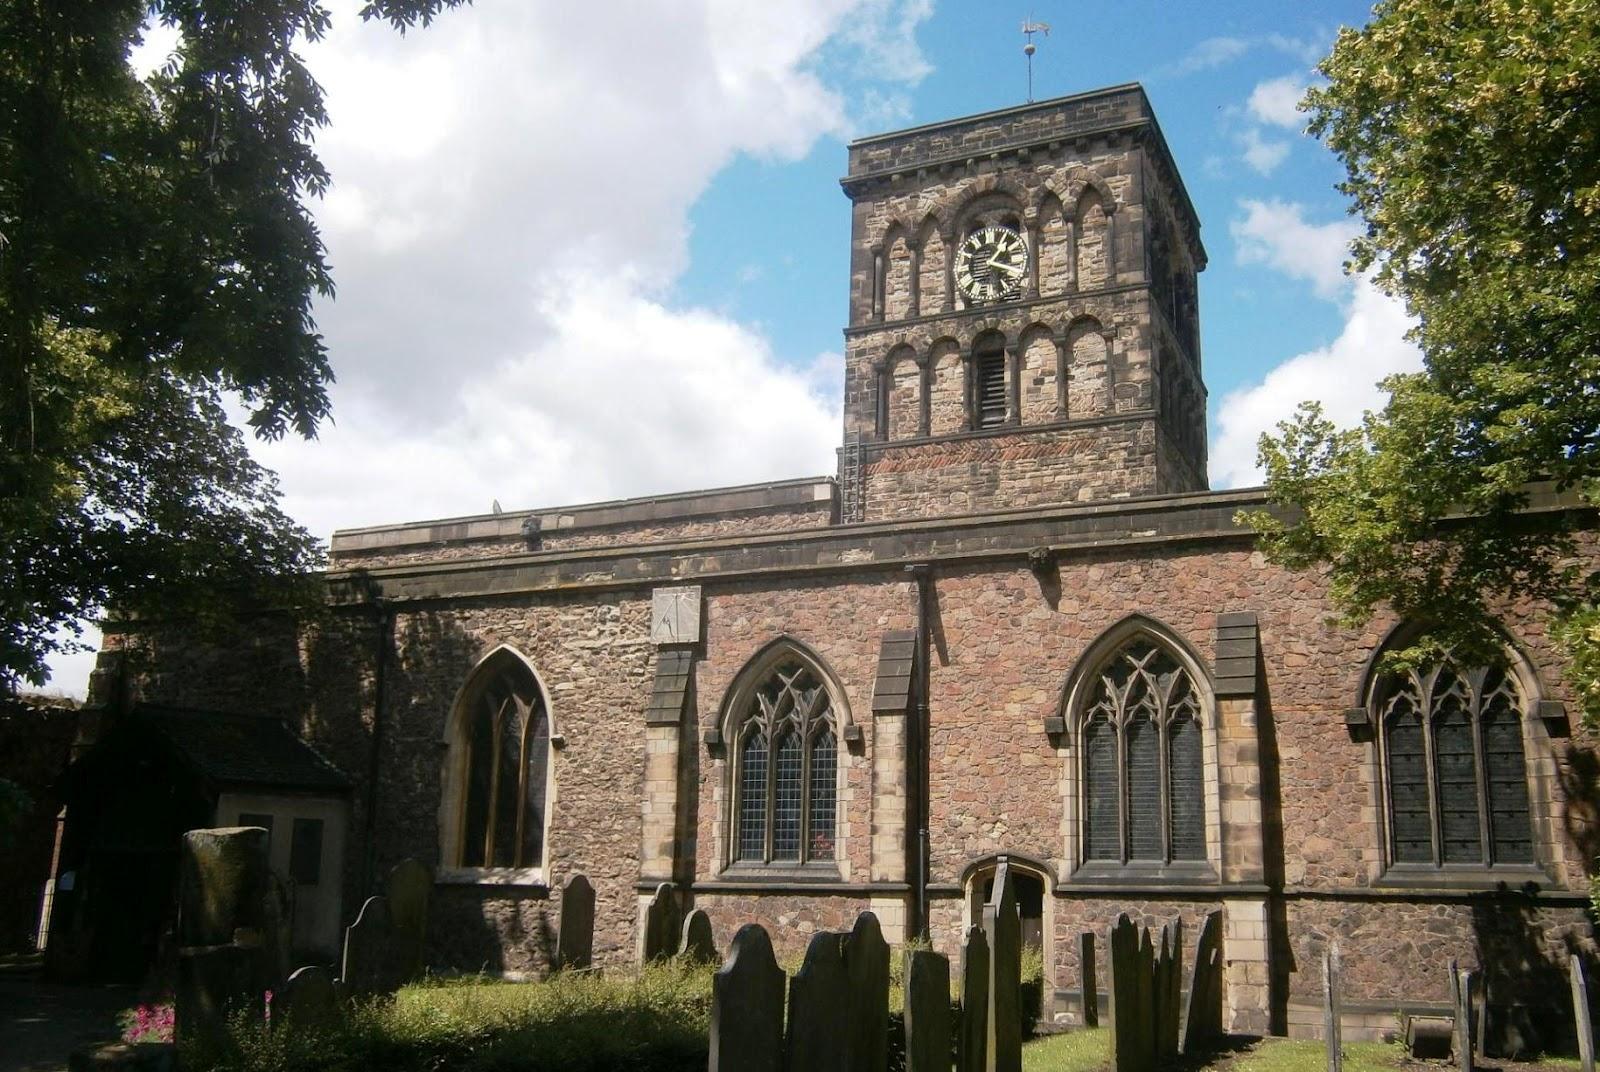 Liberal England: St Nicholas Church, Leicester